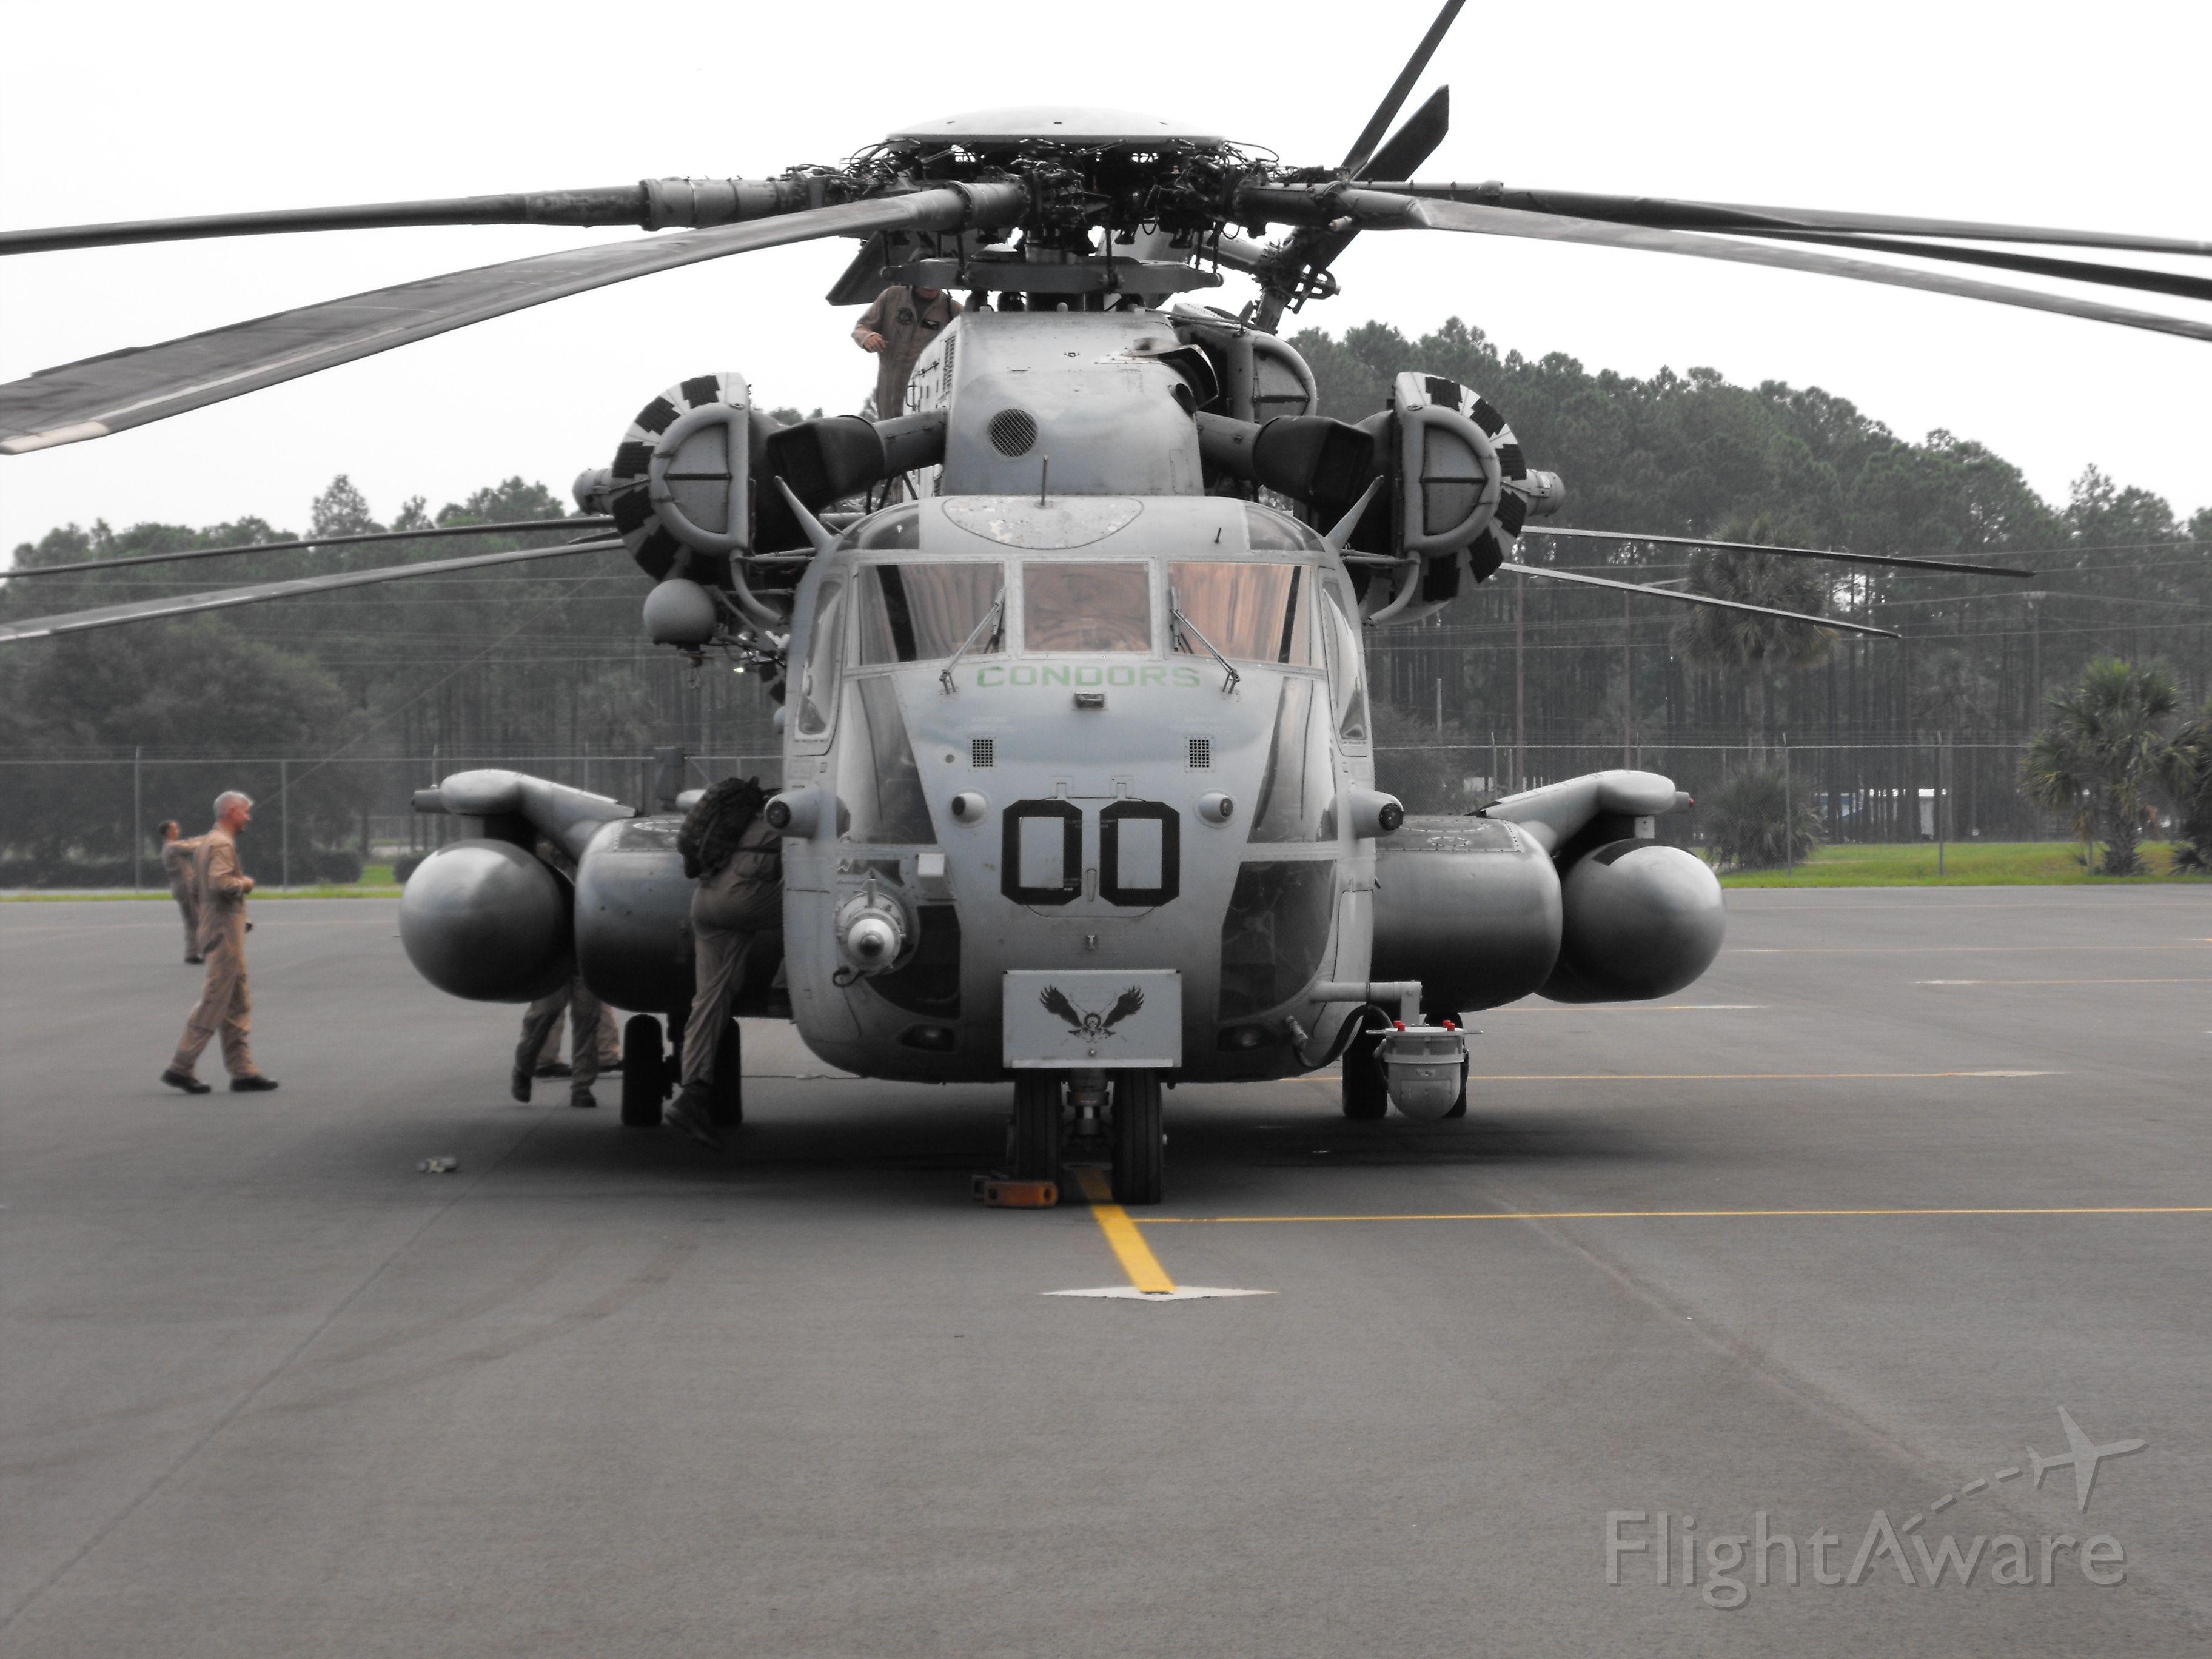 16-1180 — - 4 Marine Corps CH-53E